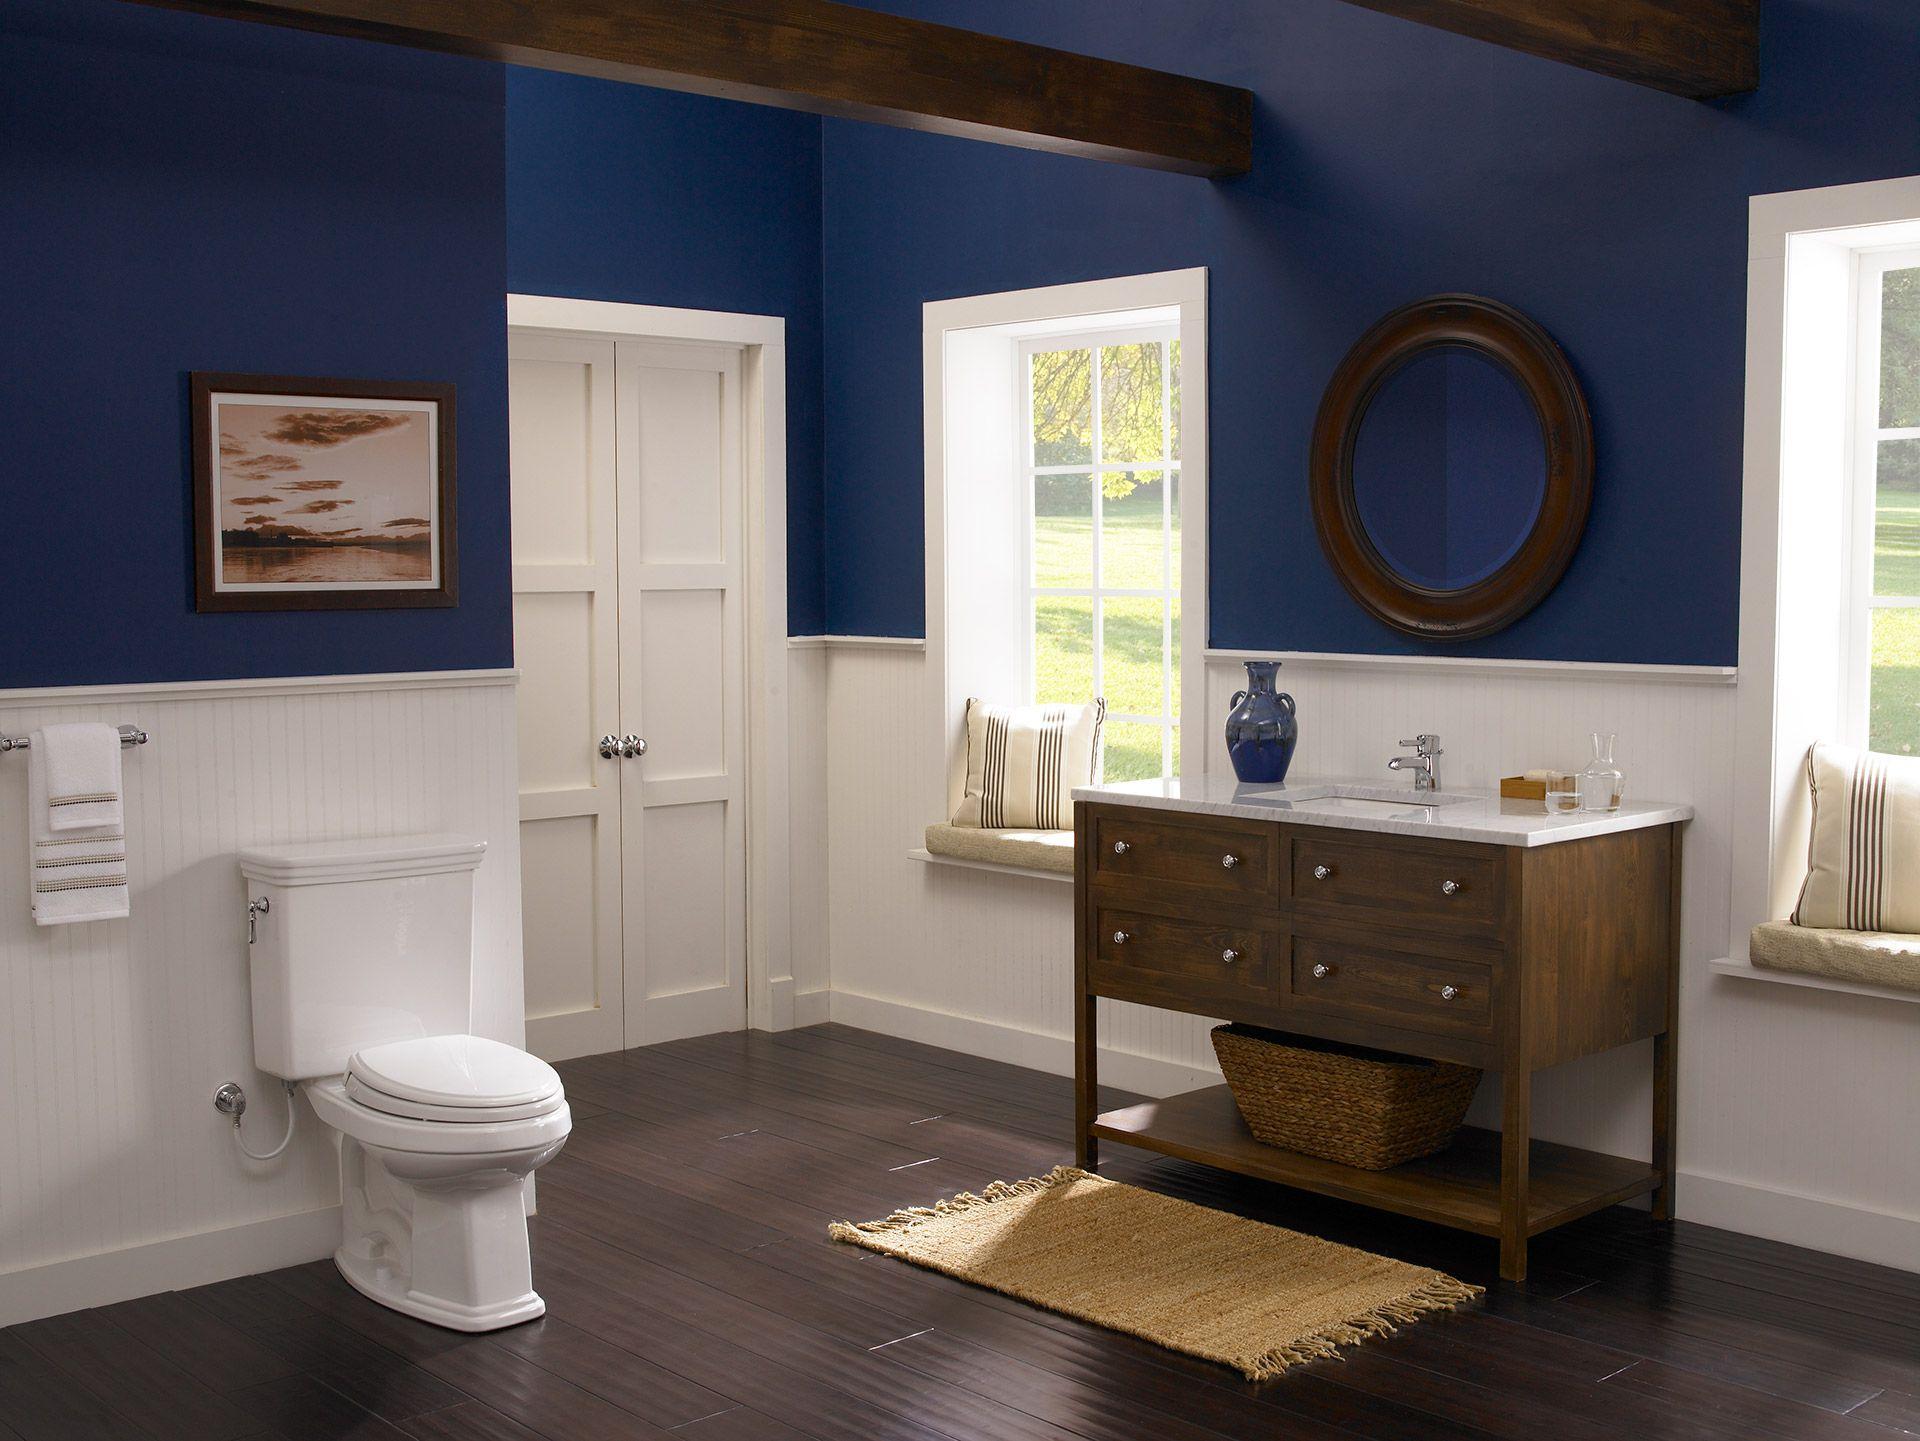 Eco Promenade® Two-Piece Toilet, 1.28 GPF, Elongated Bowl - TotoUSA.com